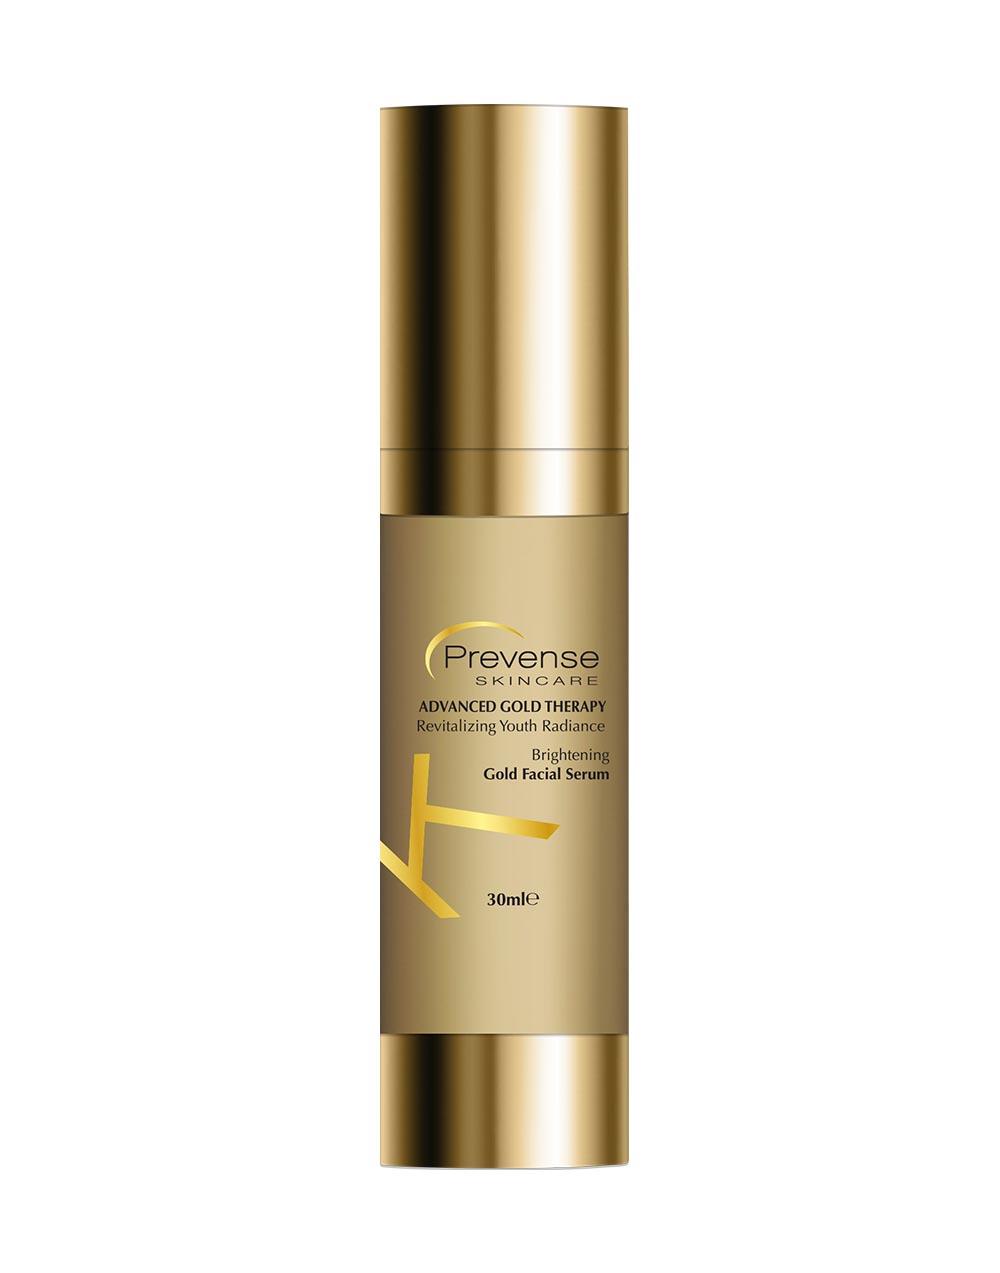 Brightening Gold Facial Serum